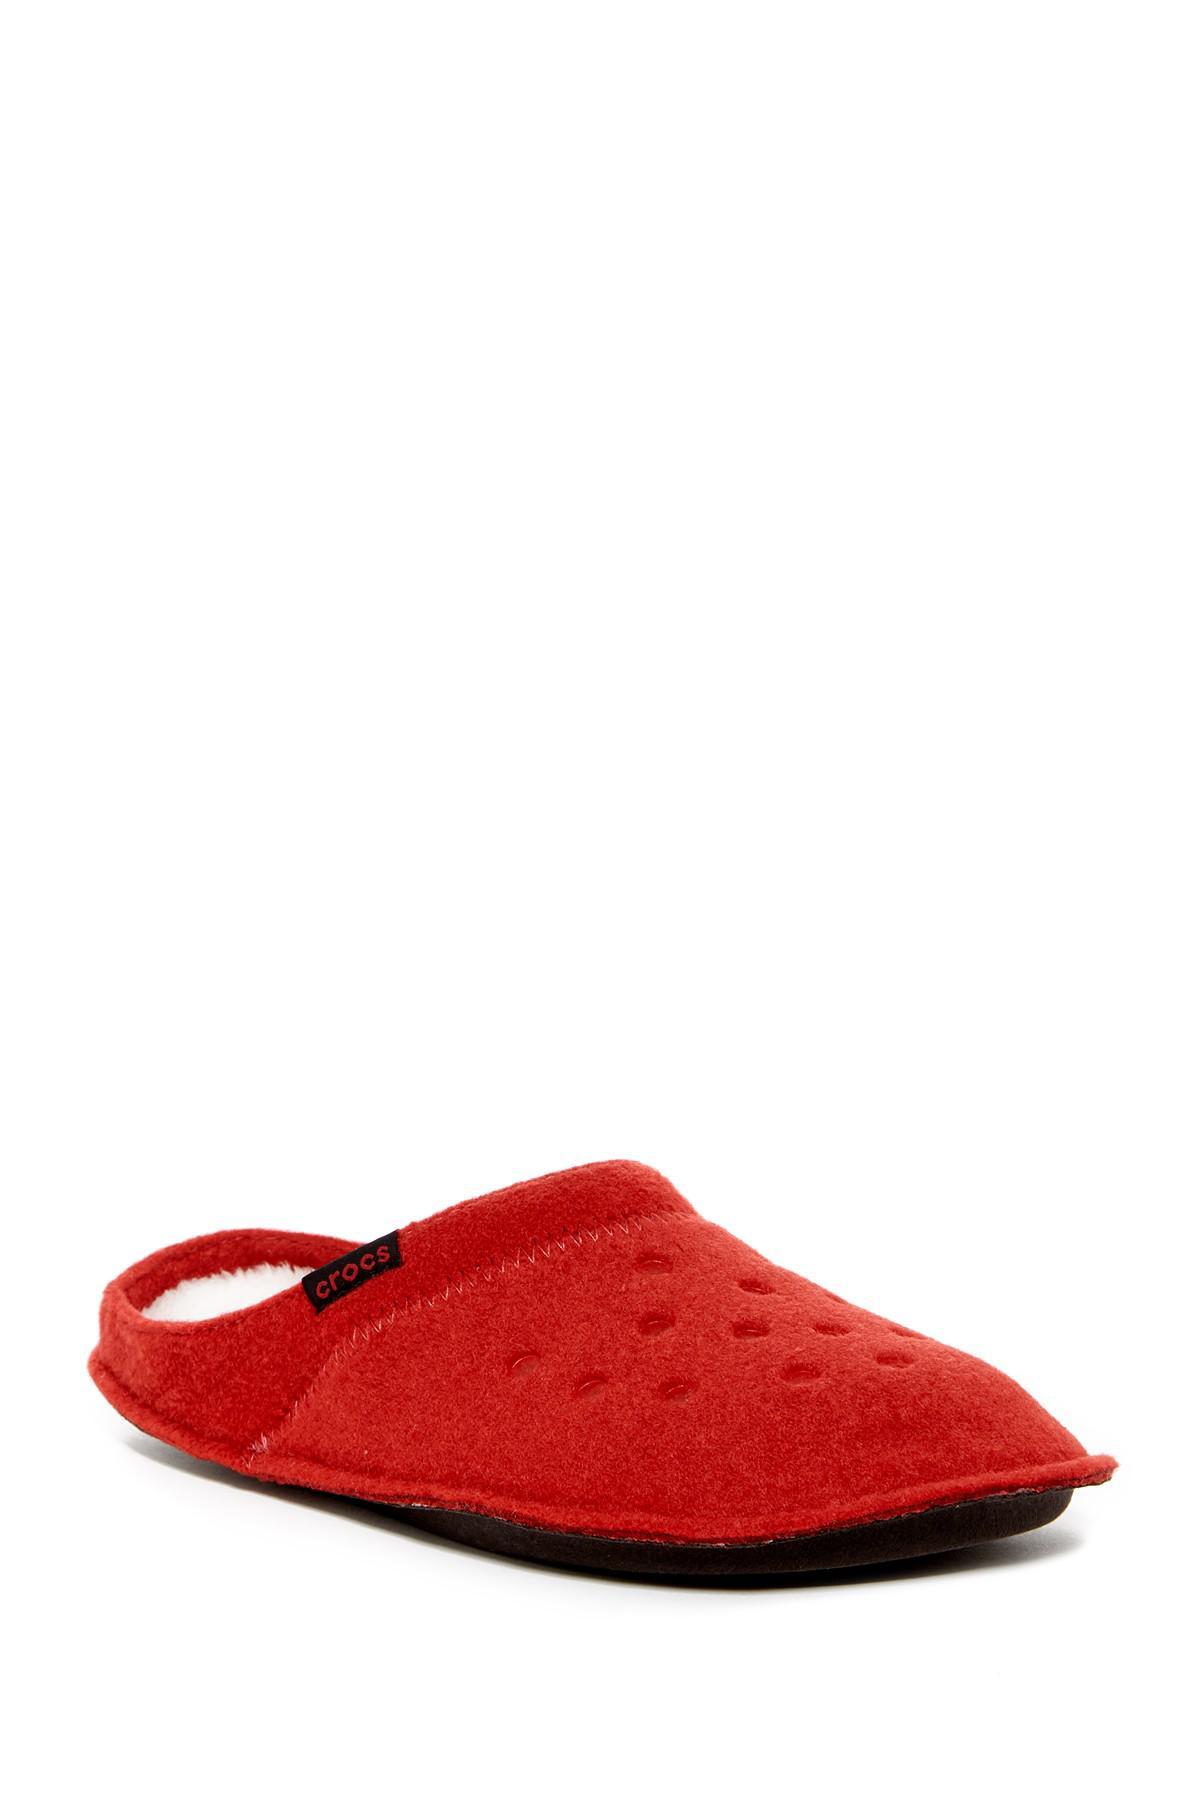 7379a4b78064eb Lyst - Crocs™ Classic Faux Fur Slipper in Red